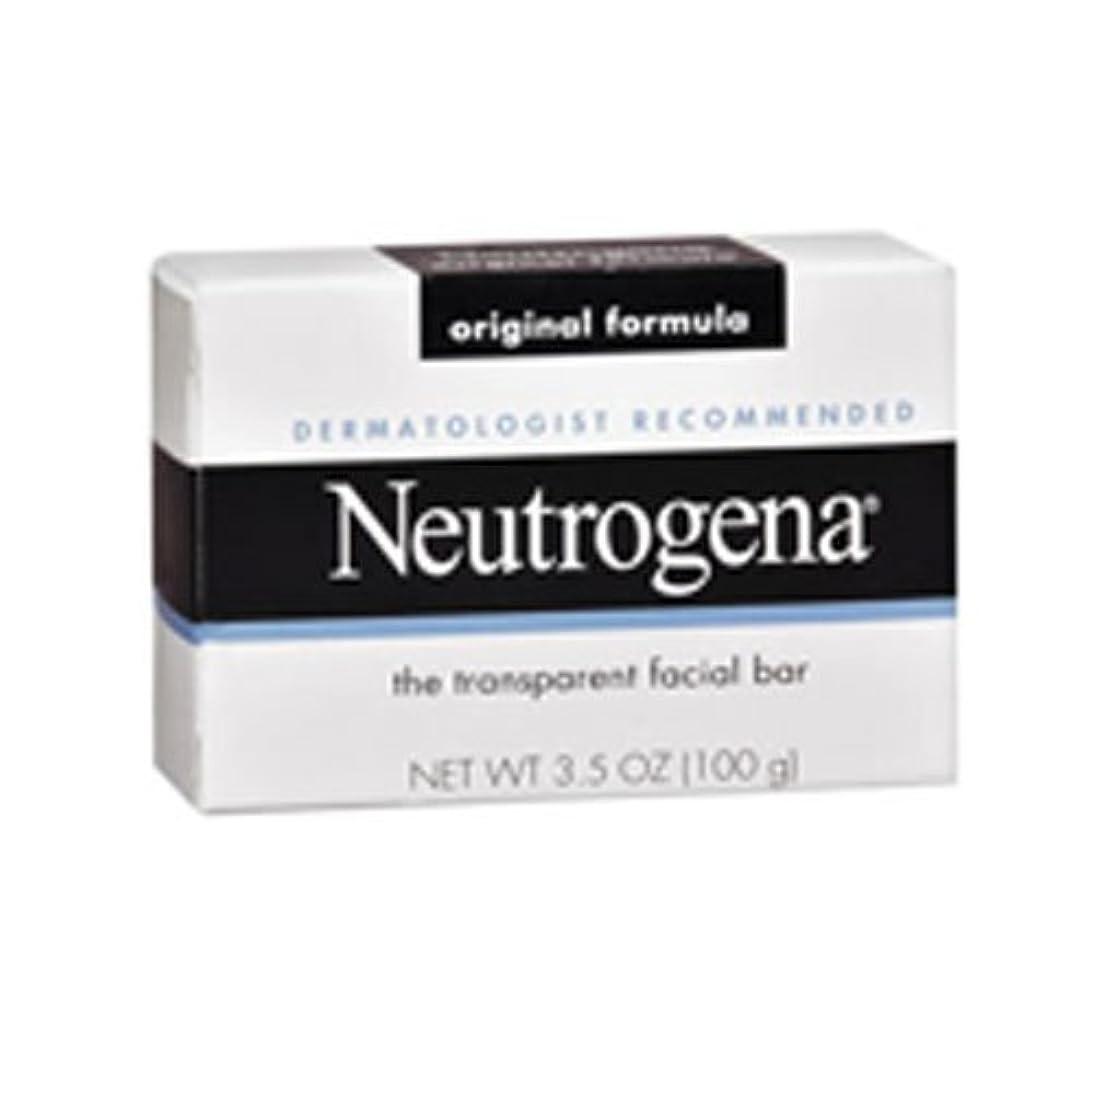 音無許可楕円形海外直送肘 Neutrogena Transparent Facial Soap Bar, 3.5 oz